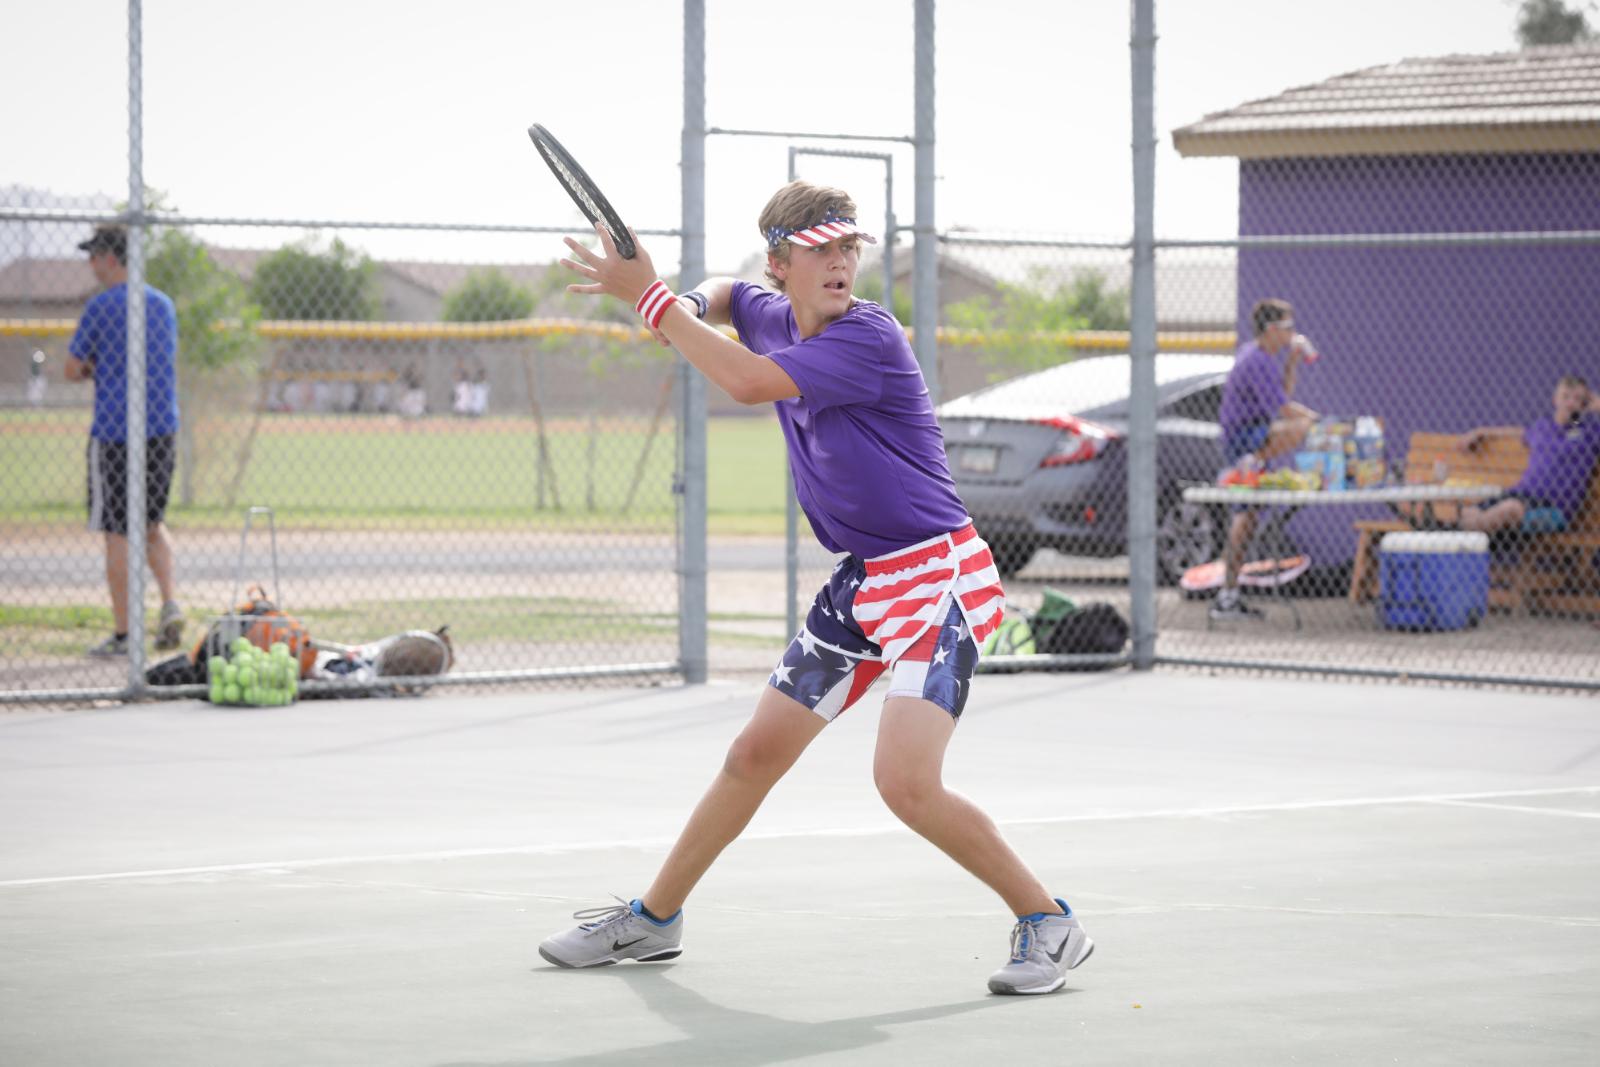 Boys tennis welcomes new coach, season starts